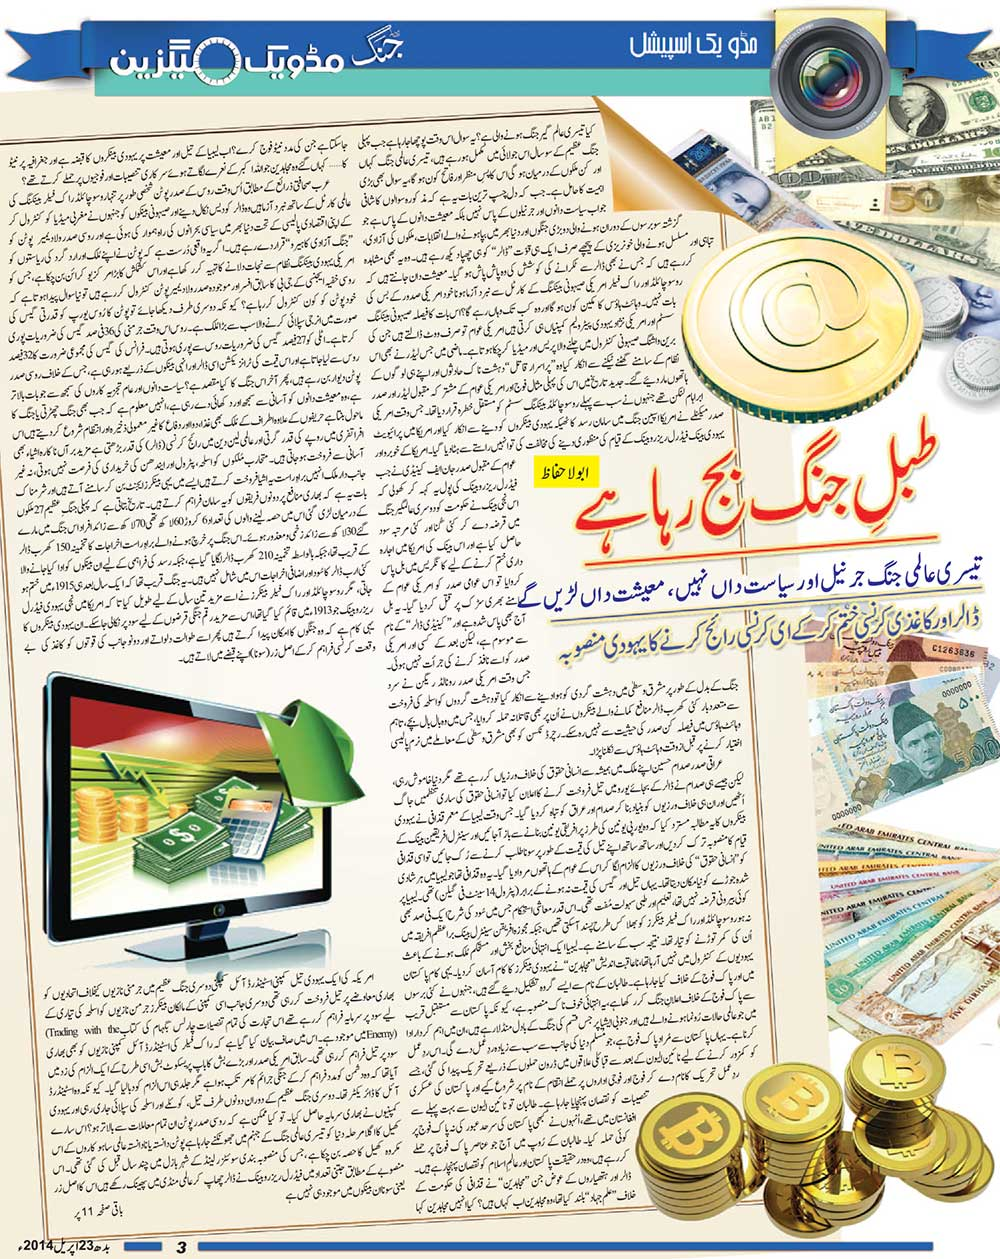 tabl-e-jang bajj raha hay e-currency,Dollar,economy,war